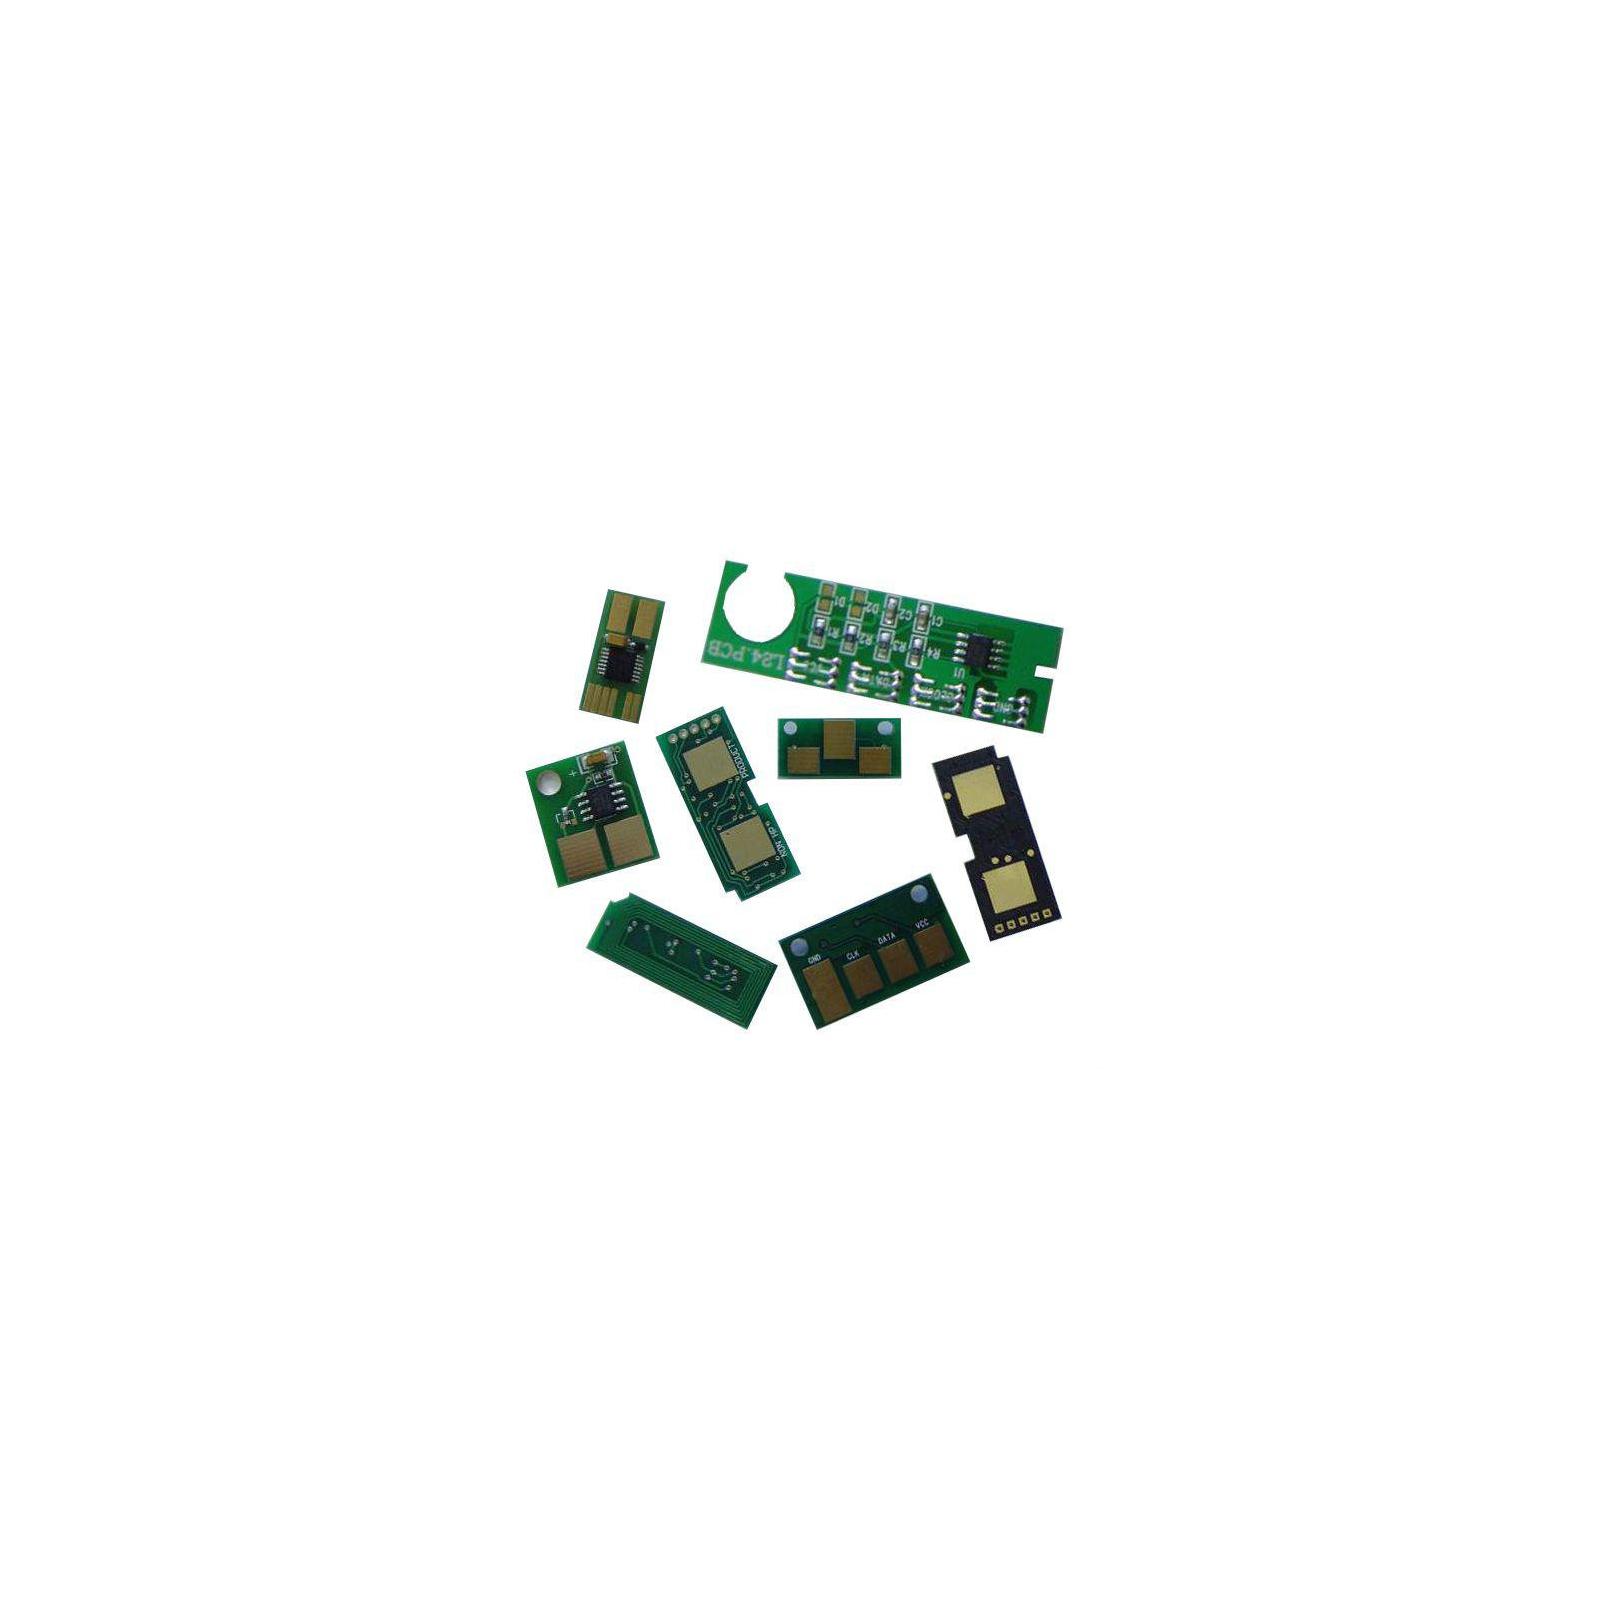 Чип для картриджа SAMSUNG SL M2020/M2070/MLT-D111S 2K NEW VERSION Everprint (CHIP-SAM-SL-M2020-N)